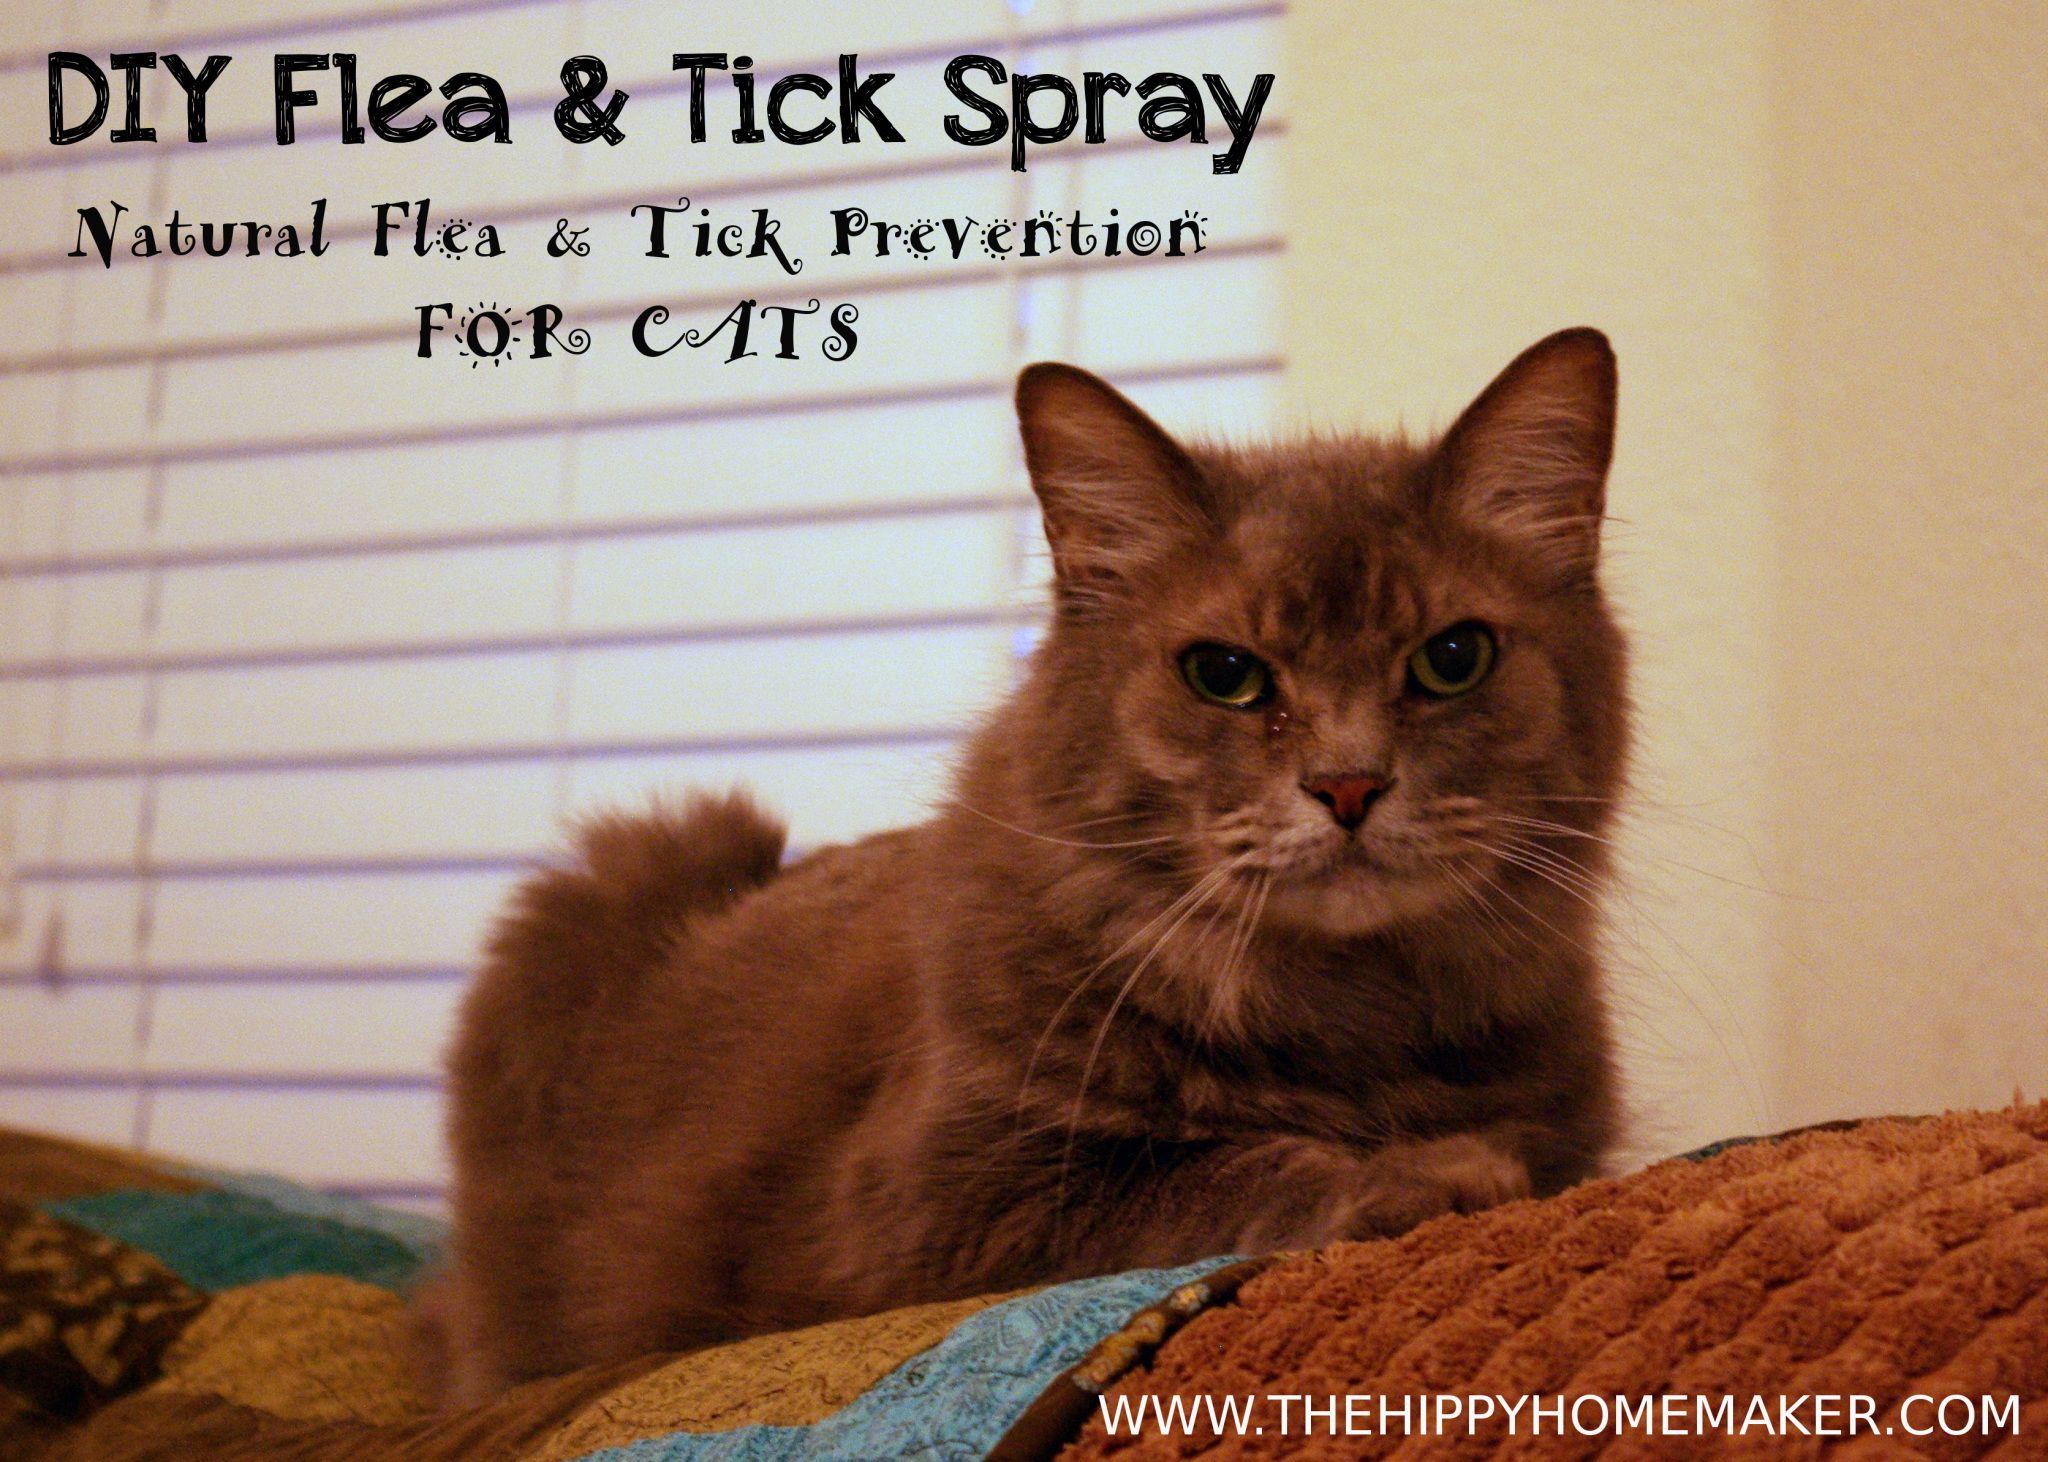 DIY Flea & Tick Spray for Cats Natural Flea & Tick